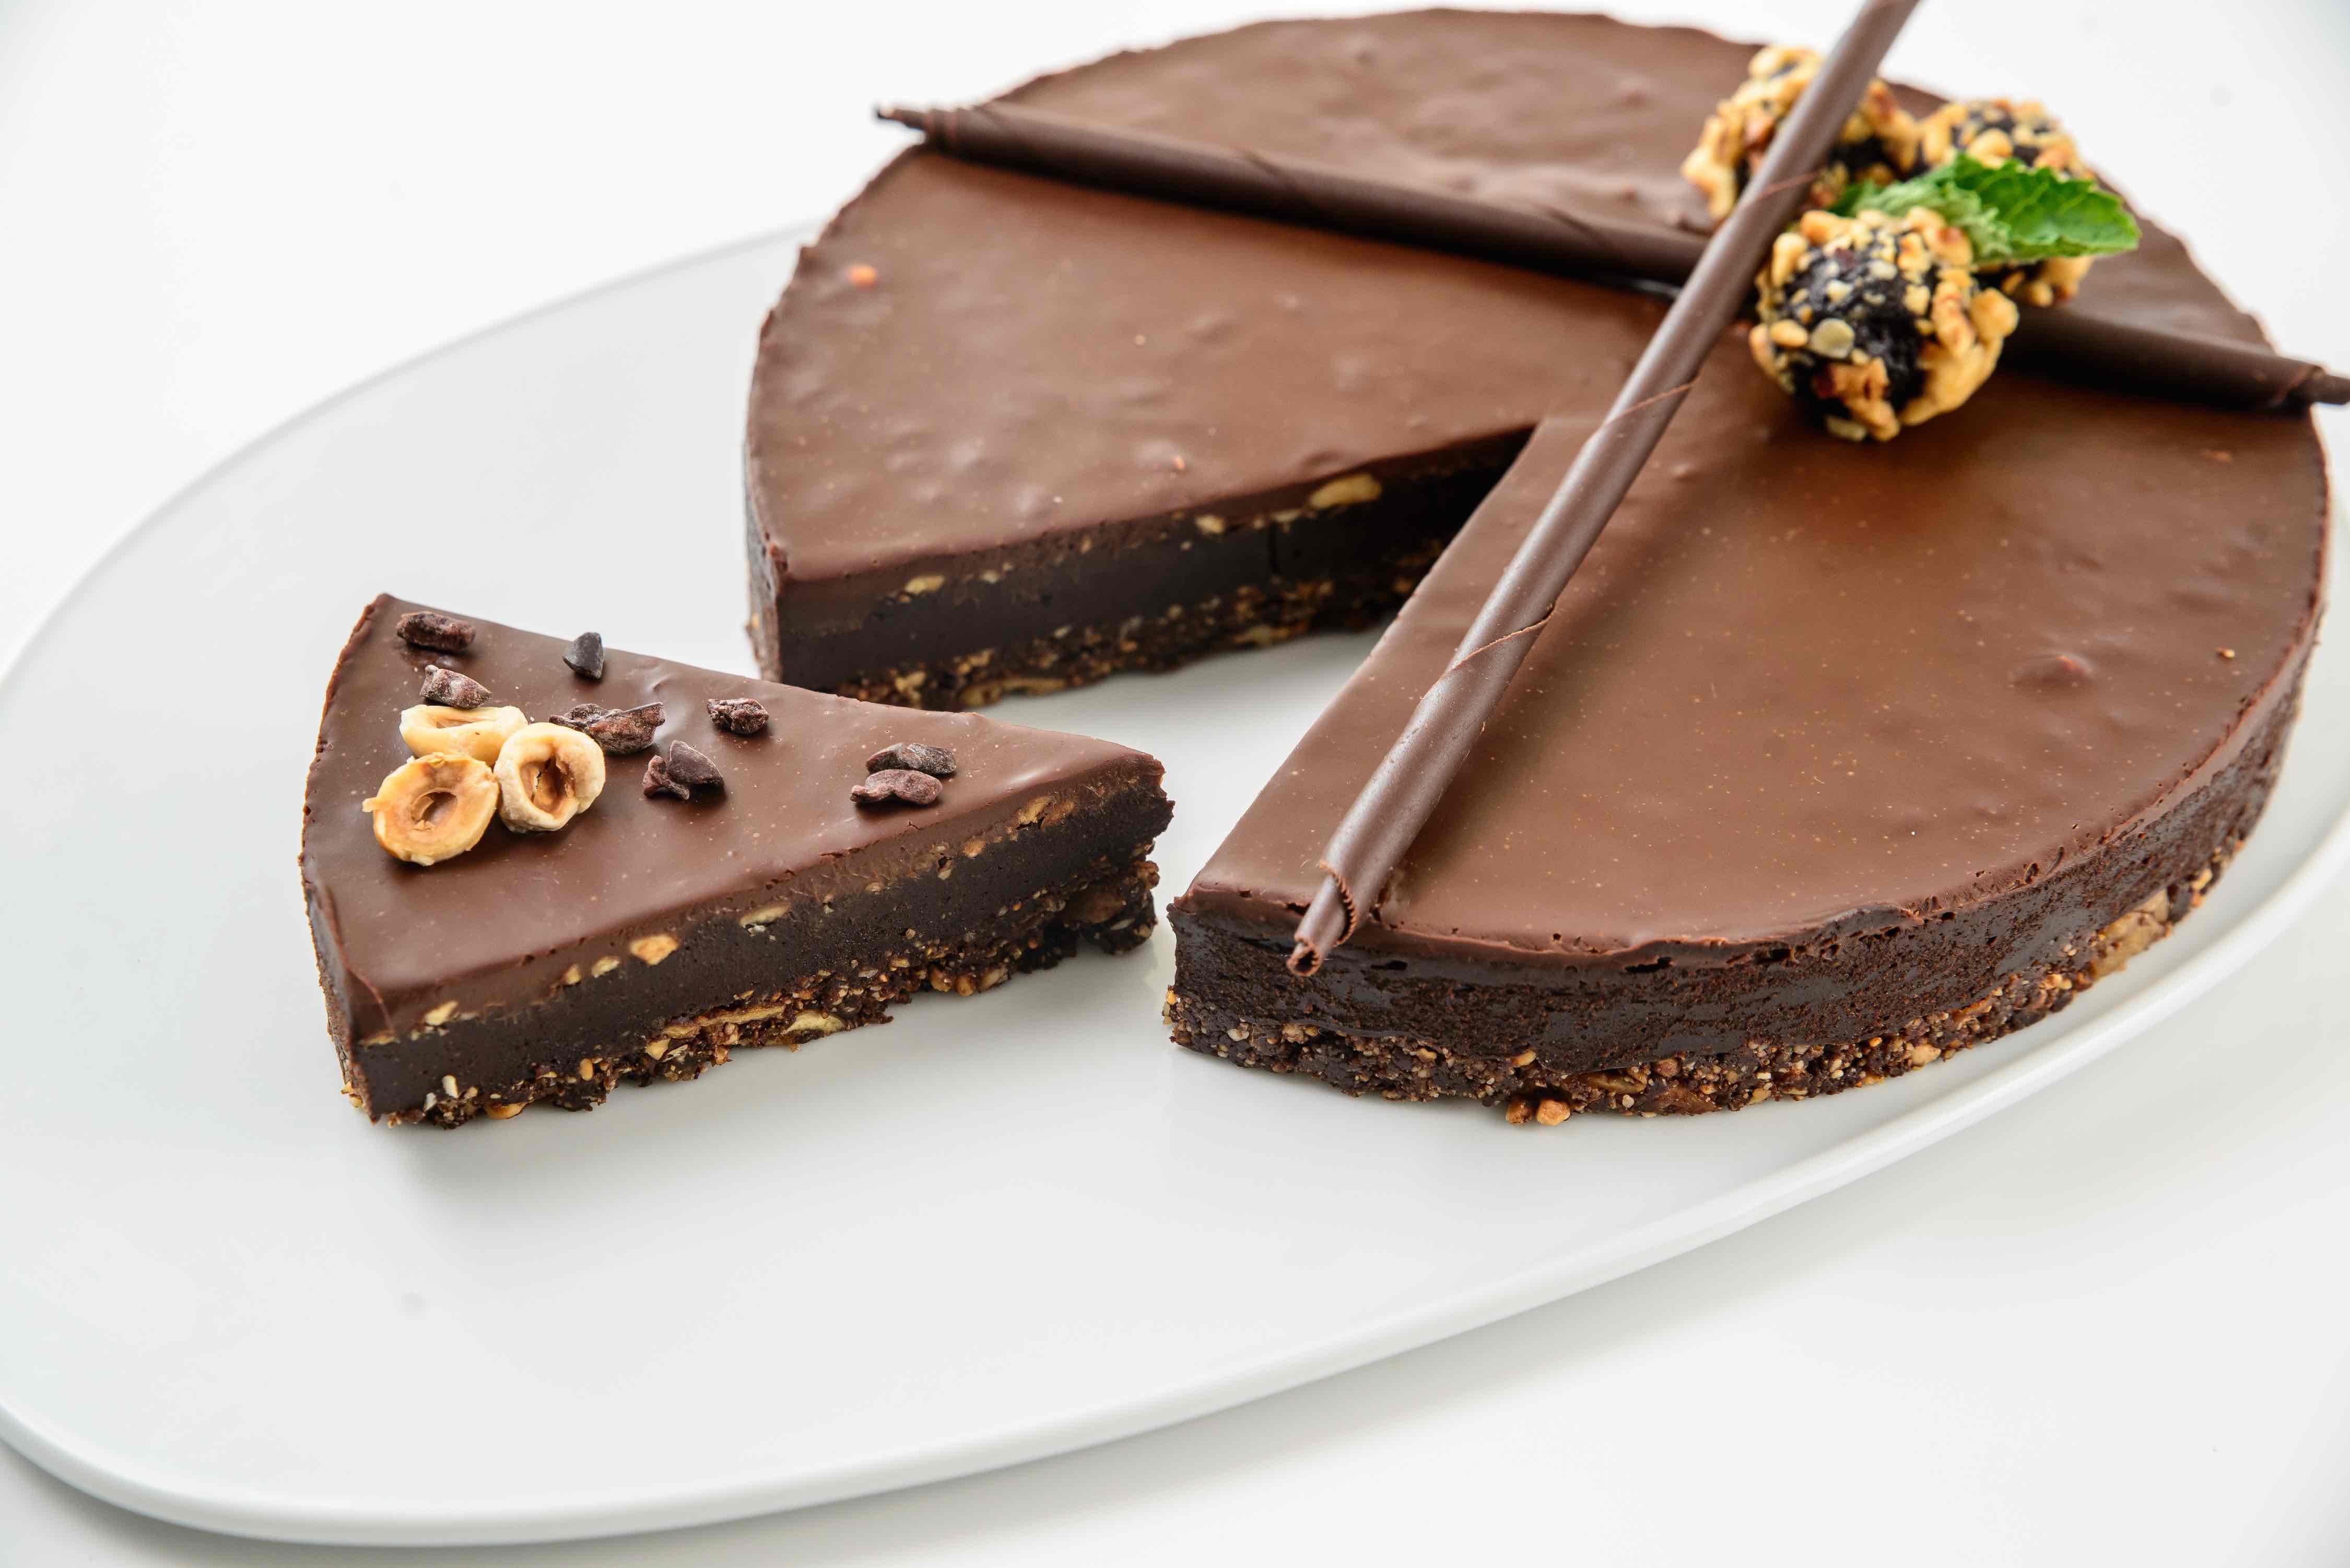 Lískooříškový cheesecake s čokoládou